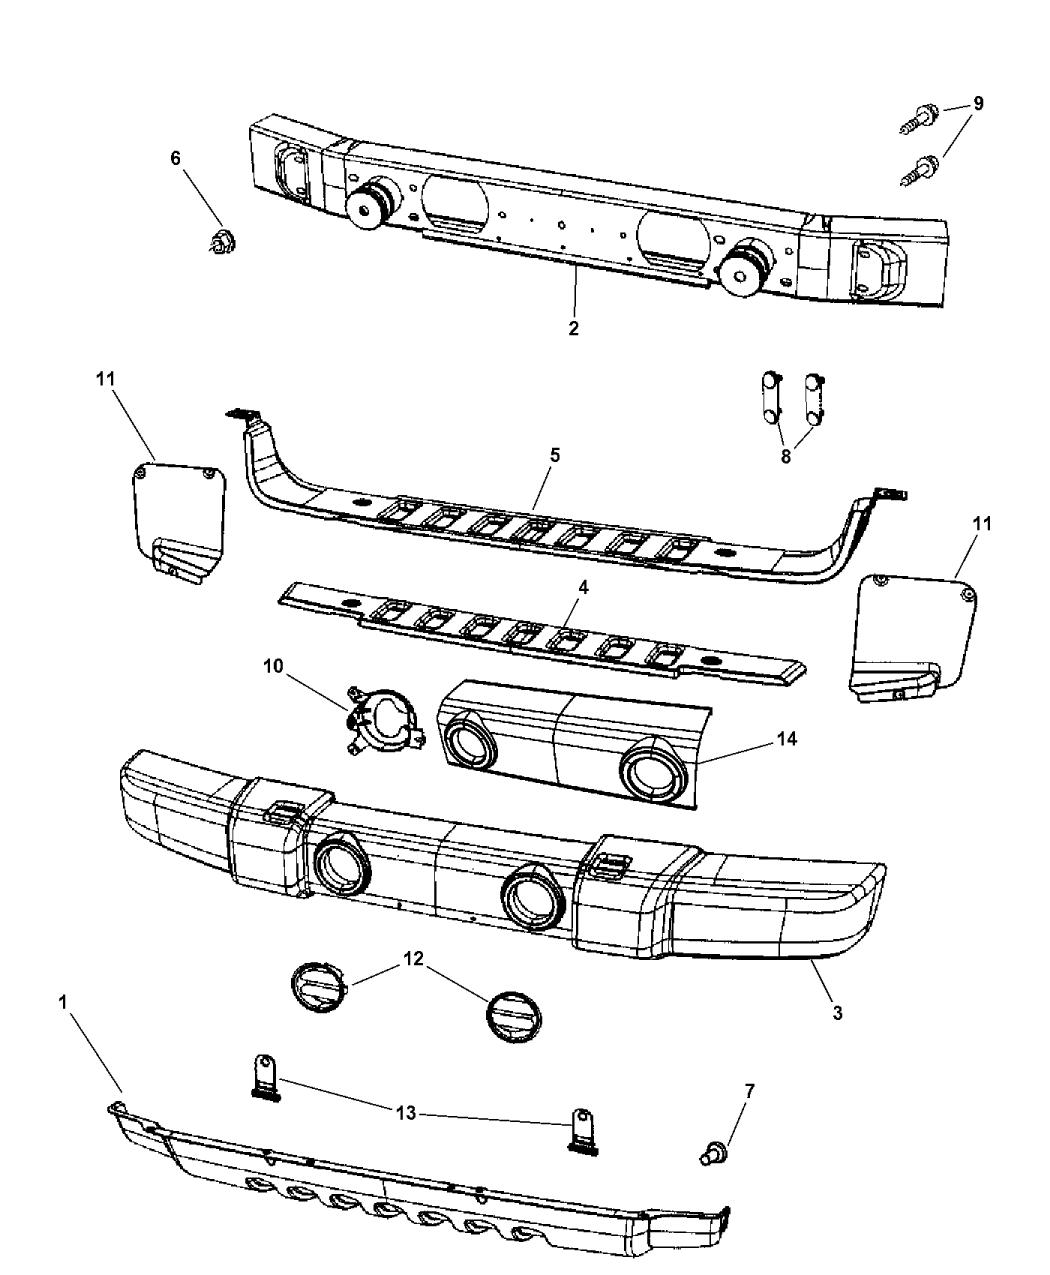 2008 jeep wrangler front bumper parts diagram  u2022 wiring